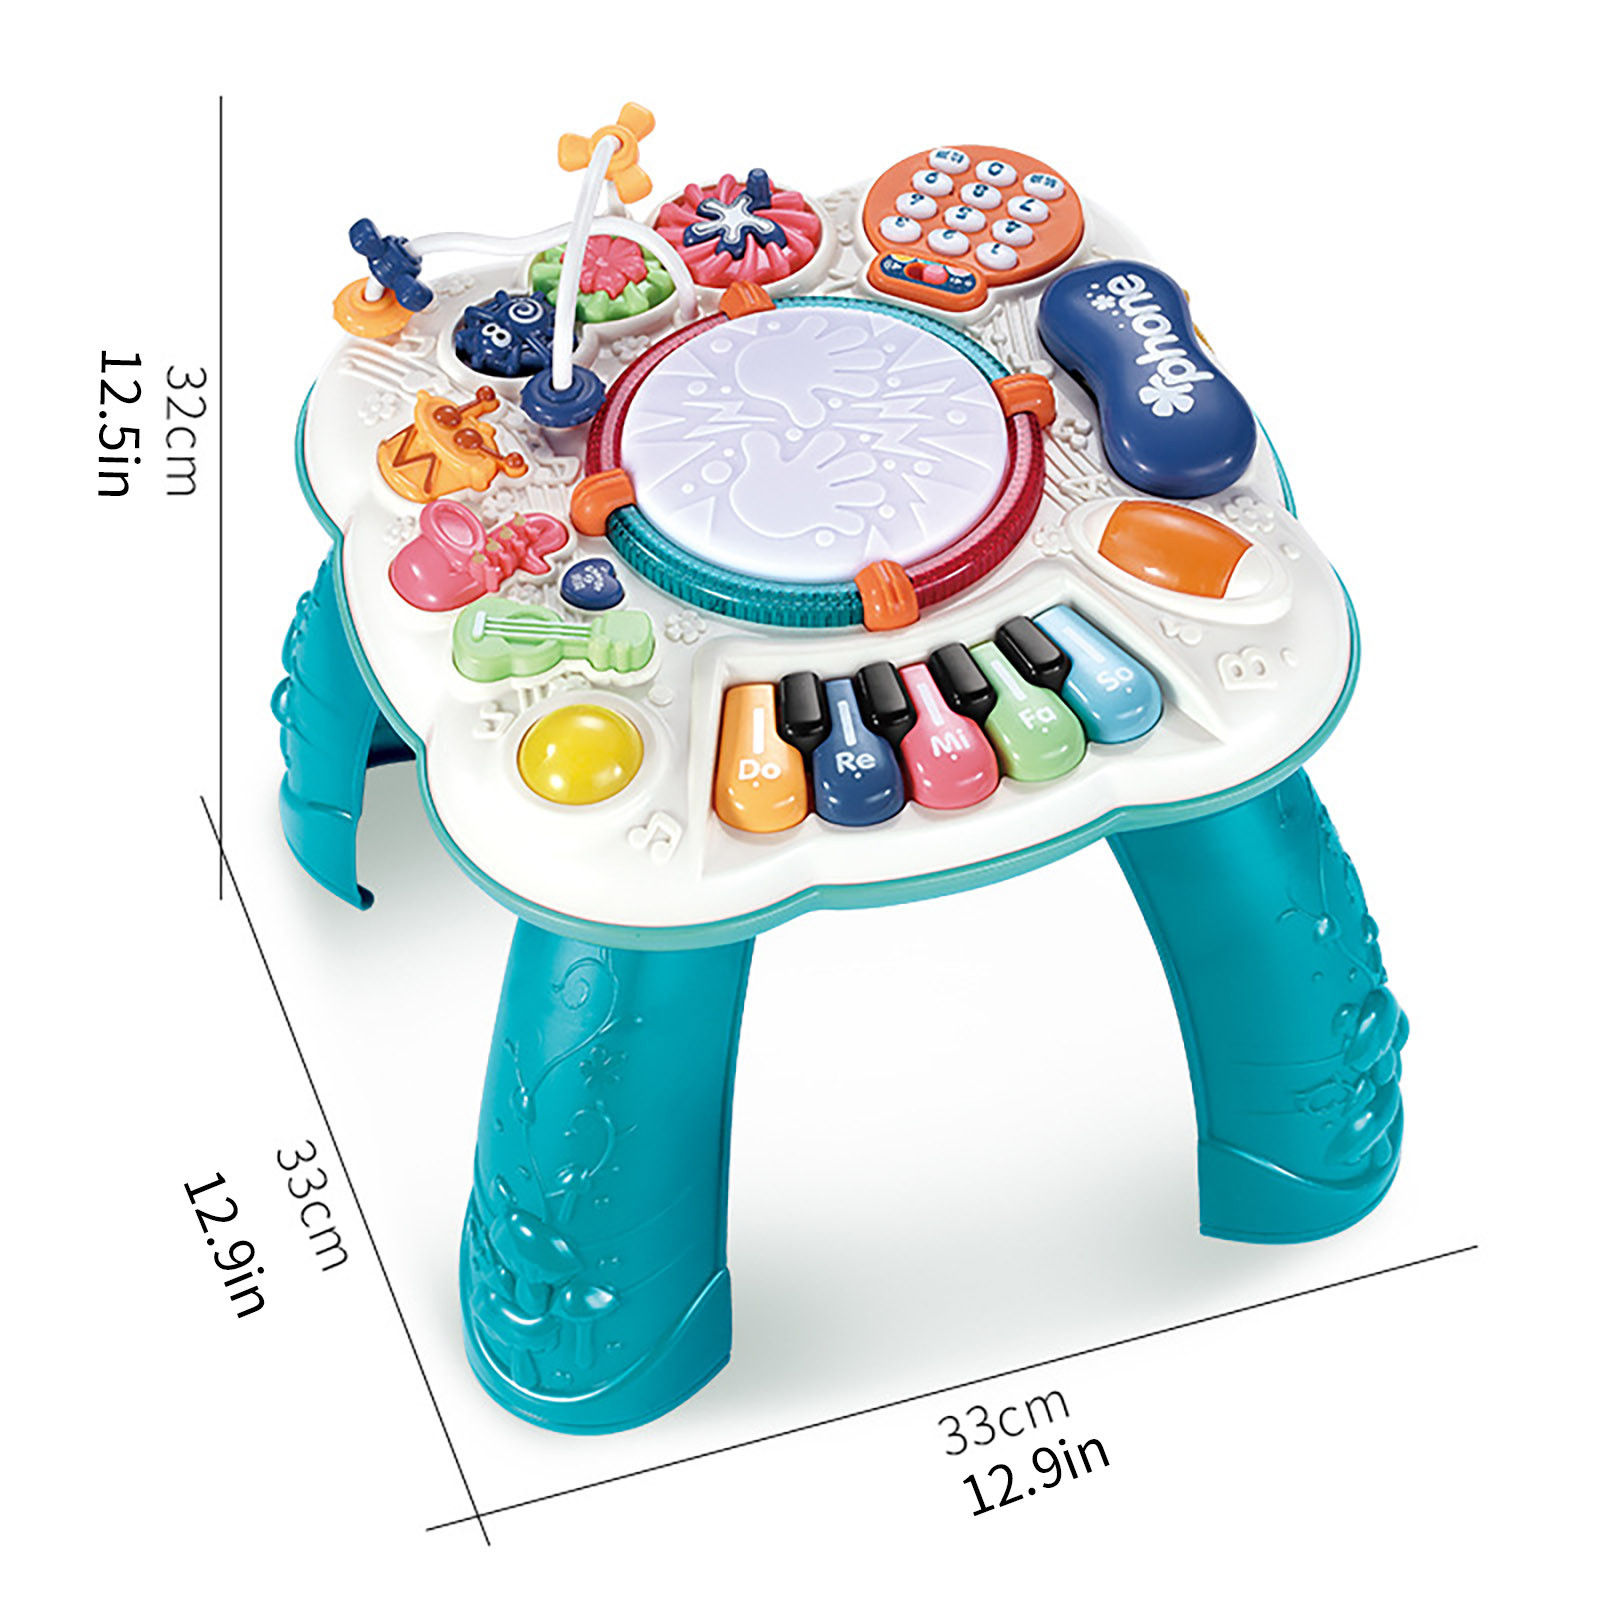 Mesa musical para bebês, máquina educacional para